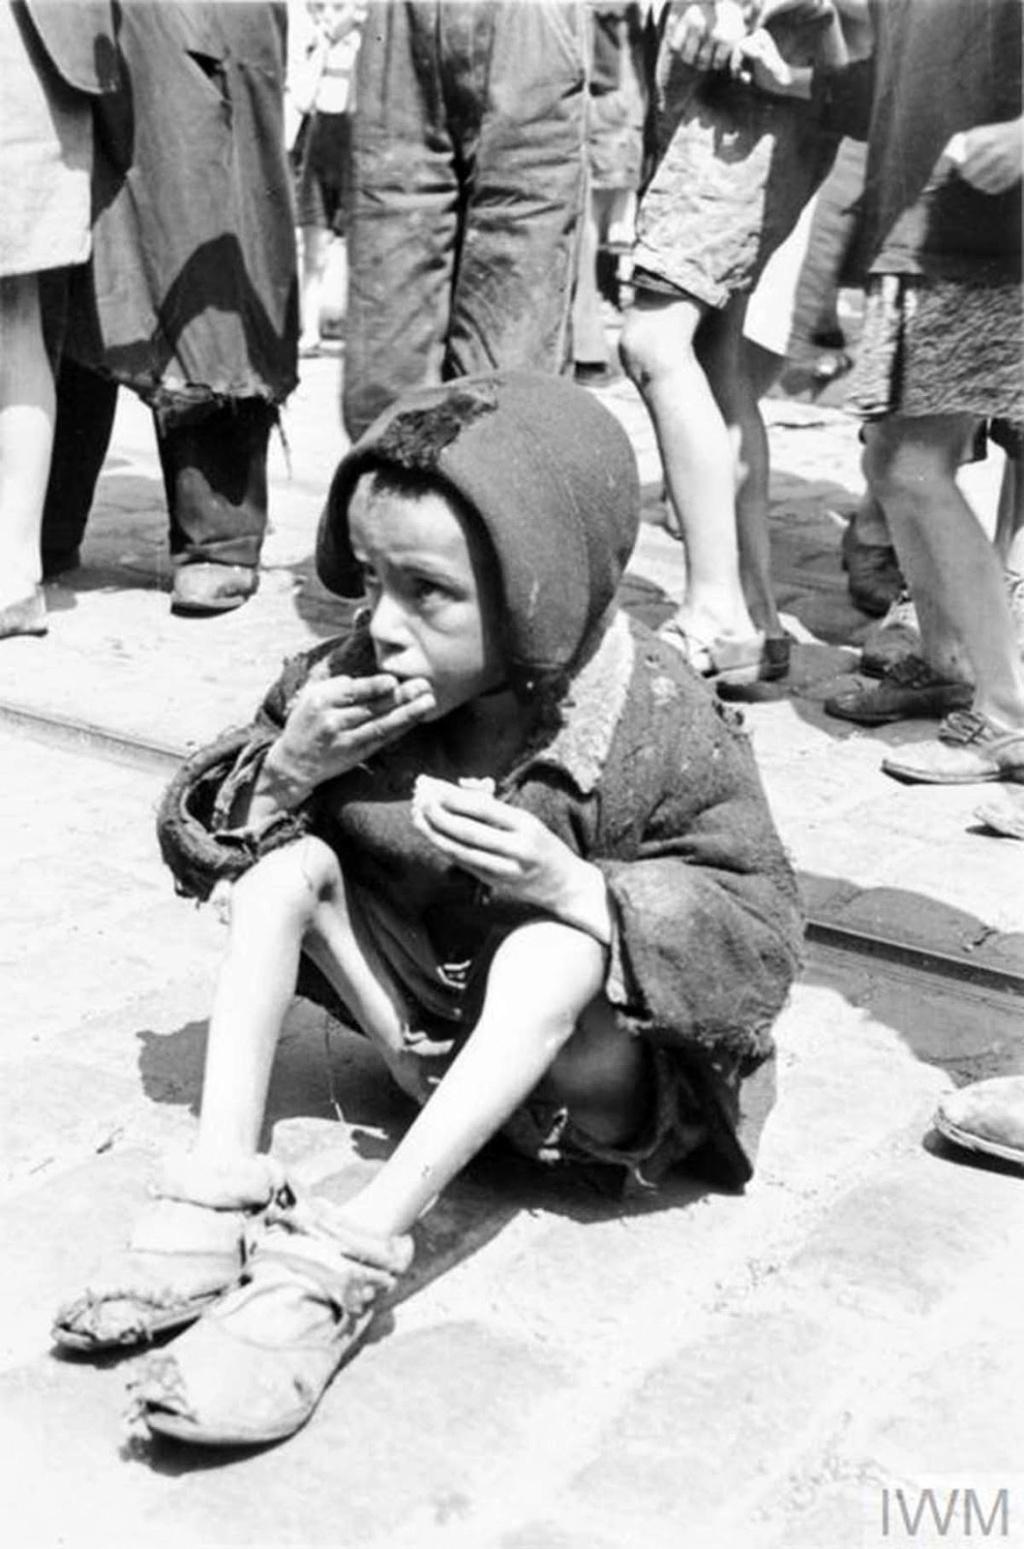 Diverses photos de la WWII - Page 40 95410